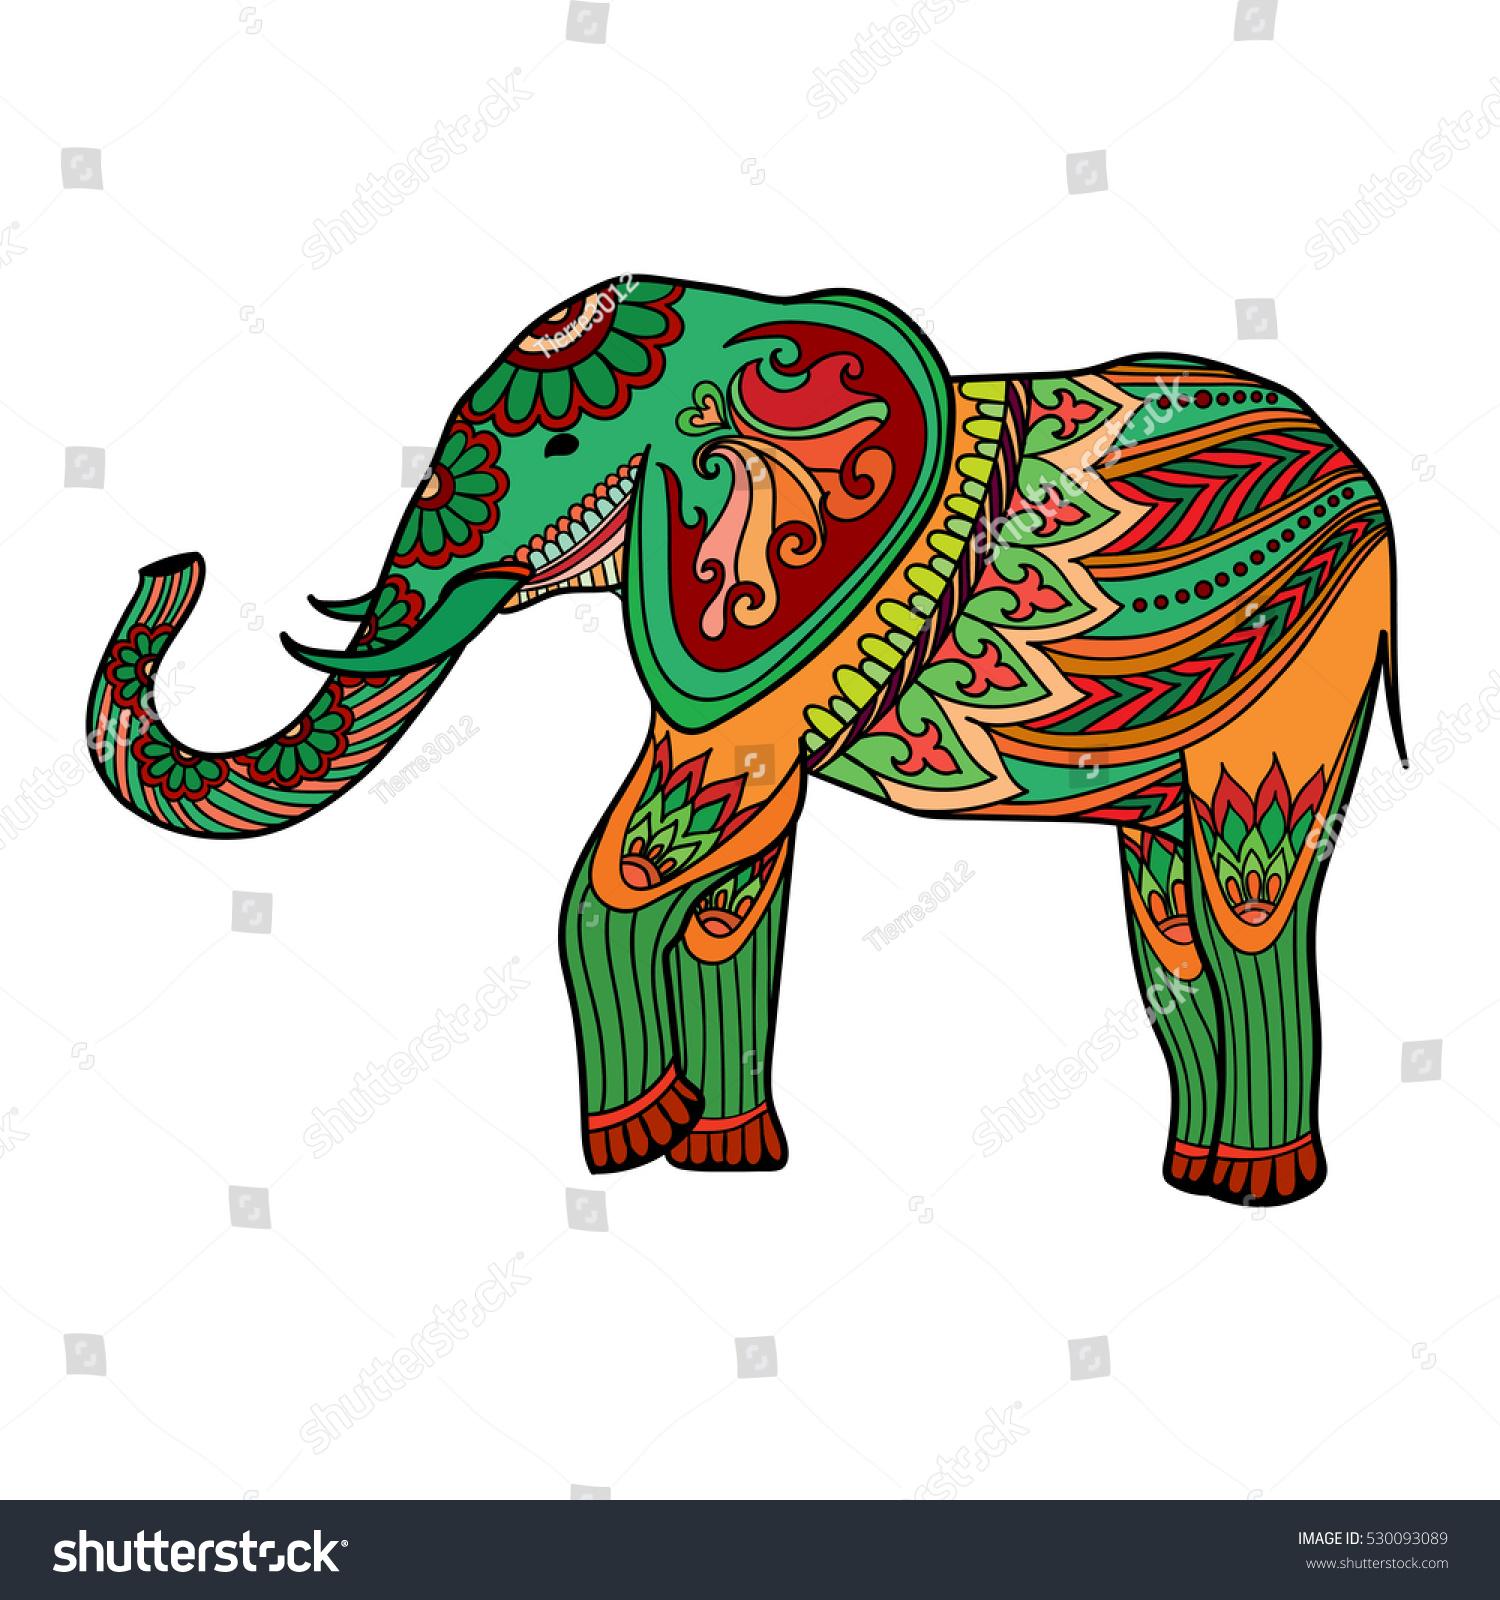 grubbs hindu personals Gitlab community edition  1-(function($) {1 +(function($, zxcvbn) {2: 2: 3: var lang = getlang() 3: var lang = getlang(.